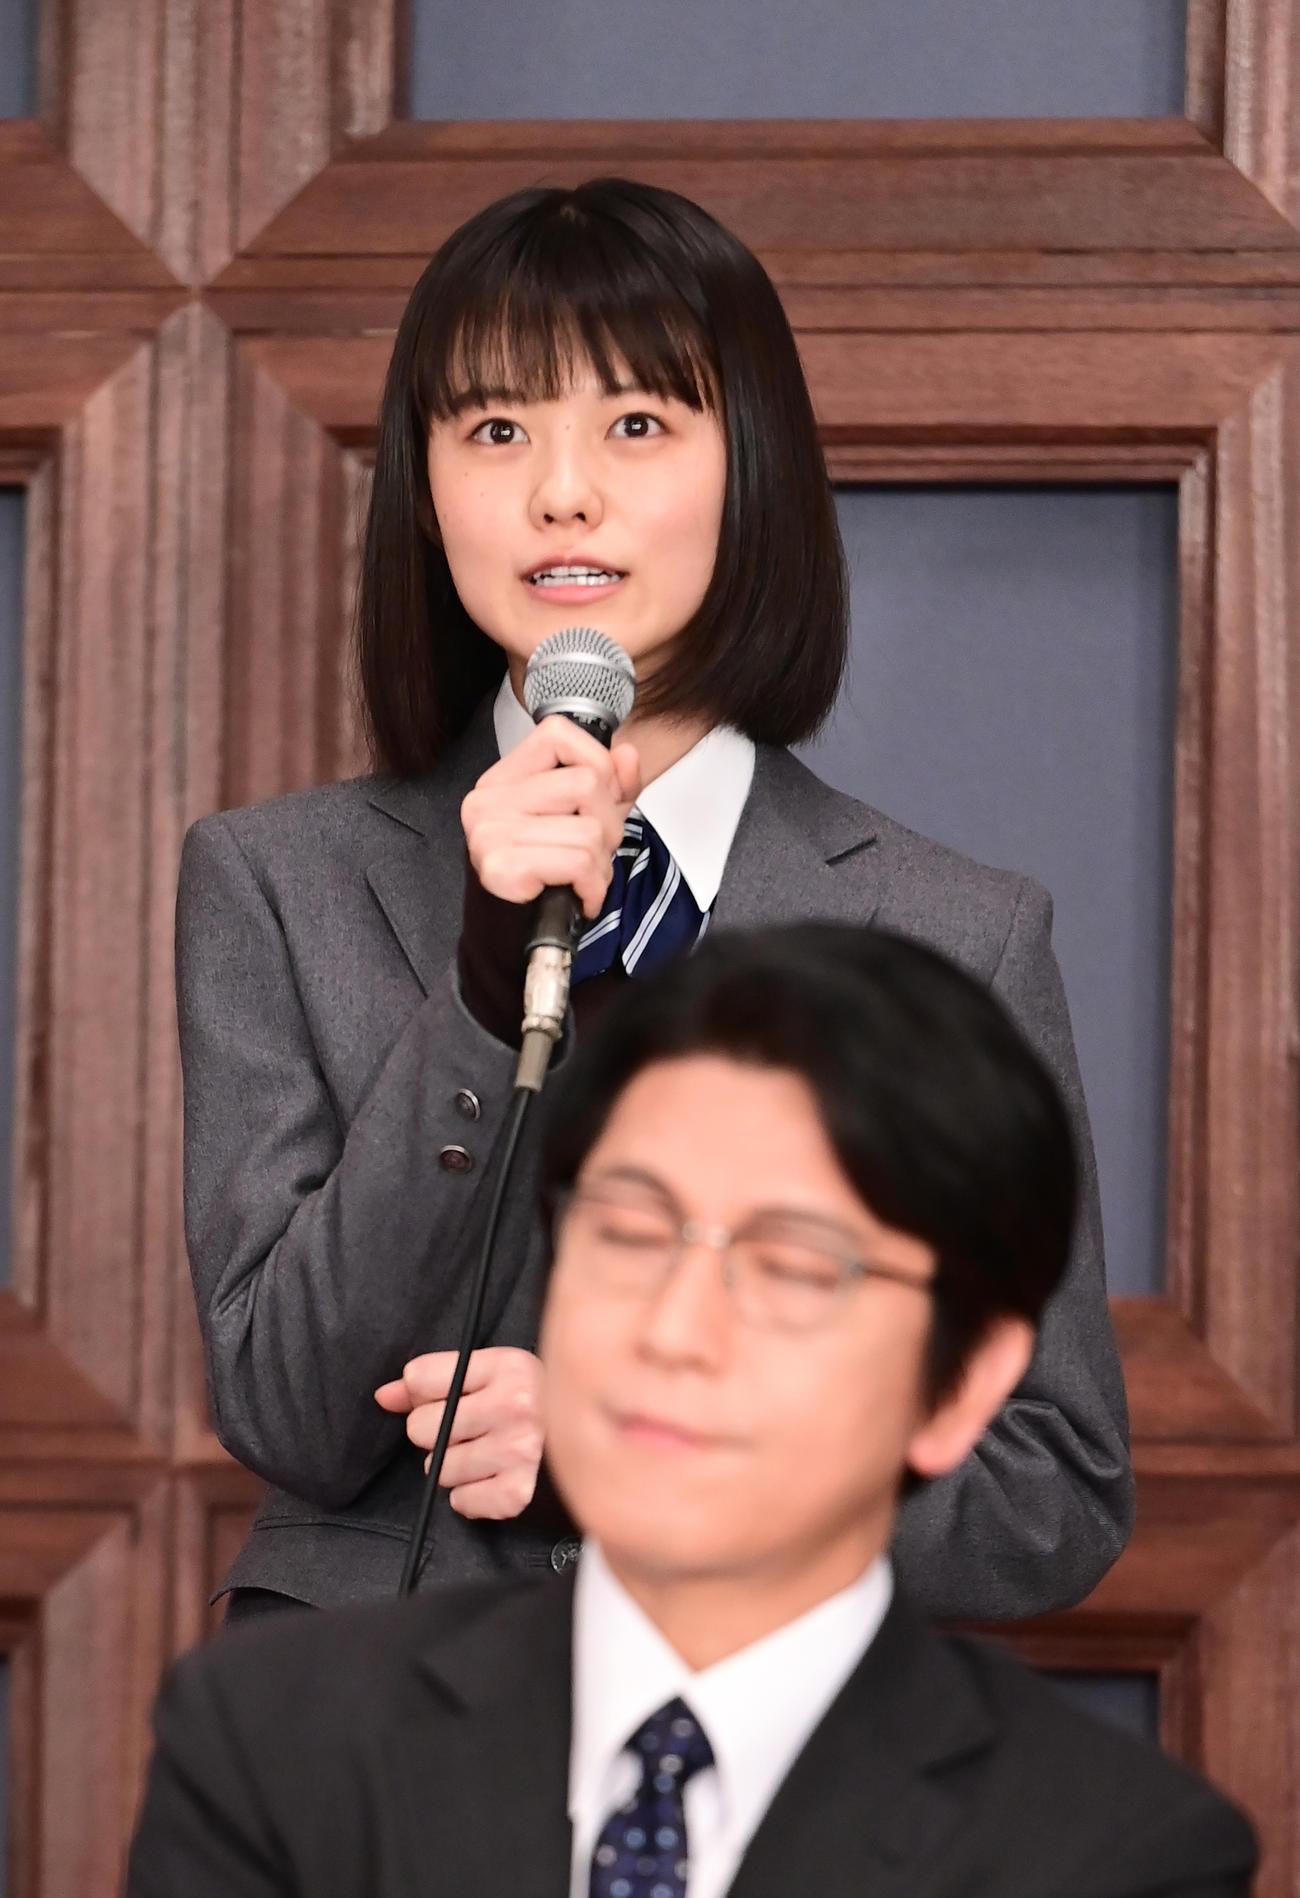 TBS系日曜劇場「ドラゴン桜」制作発表に臨む志田彩良。手前は及川光博(撮影・小沢裕)